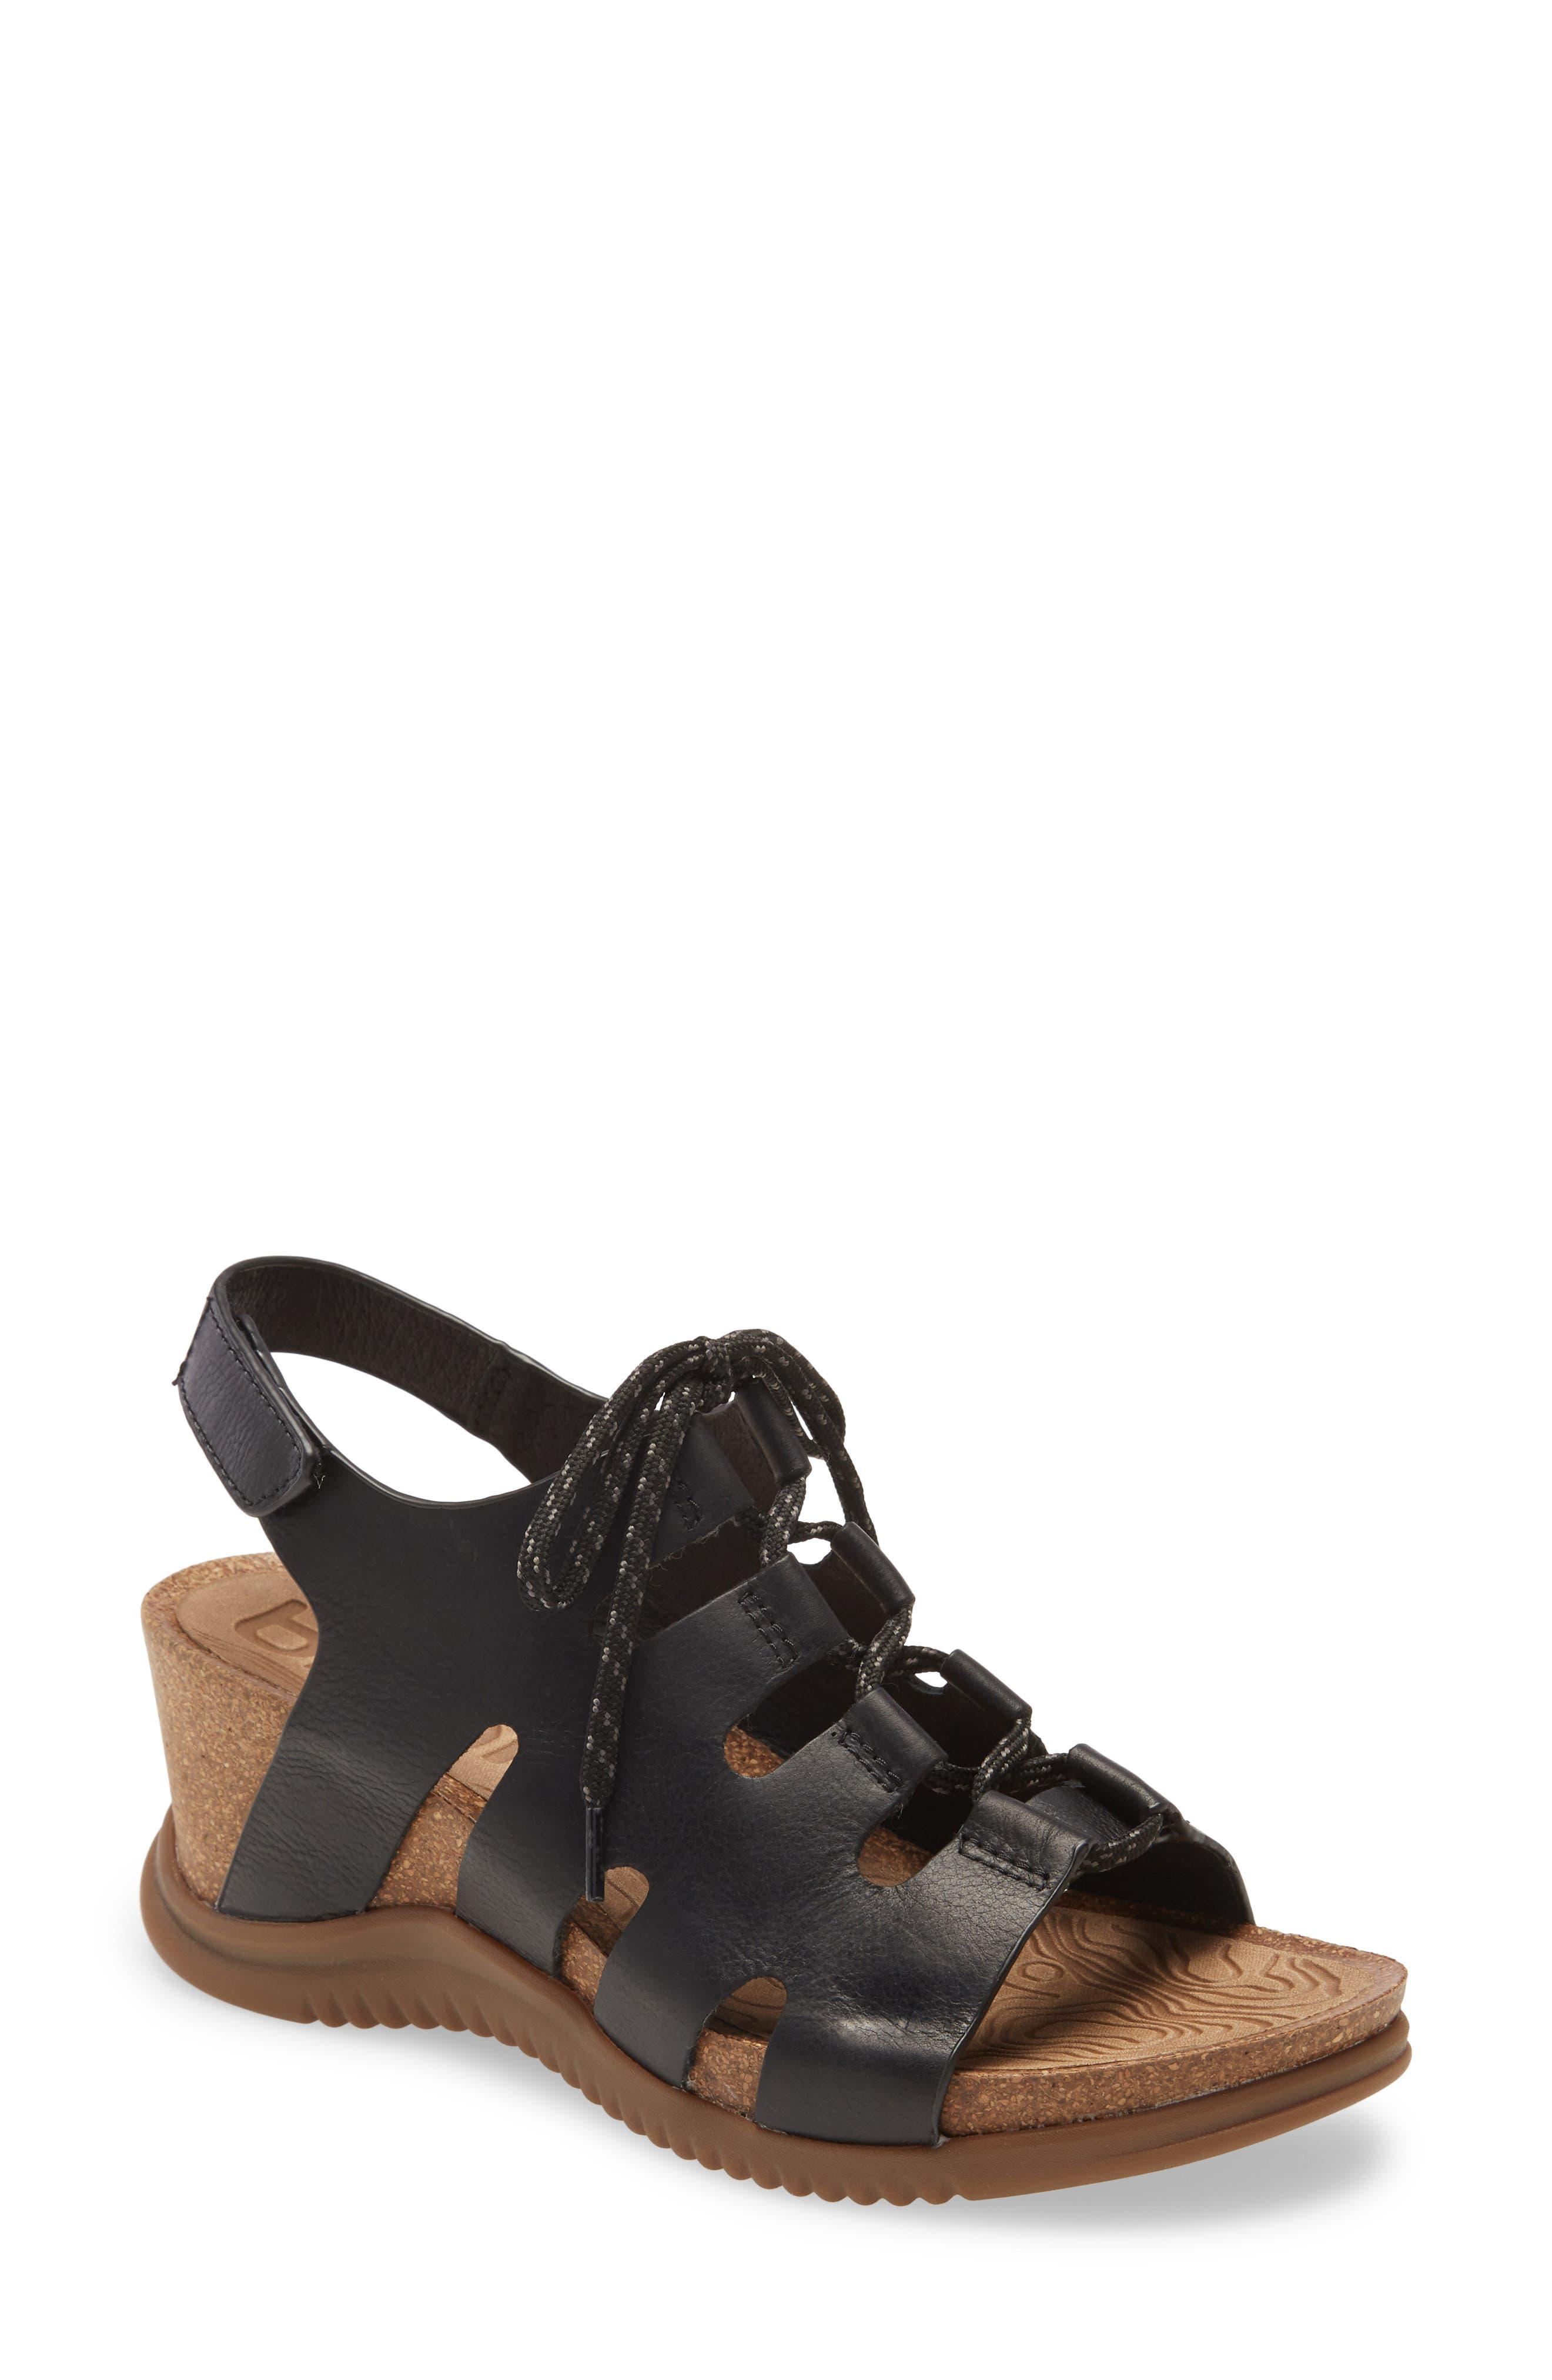 Women's Bionica Sorena Ghillie Wedge Sandal, Size 8.5 M - Black